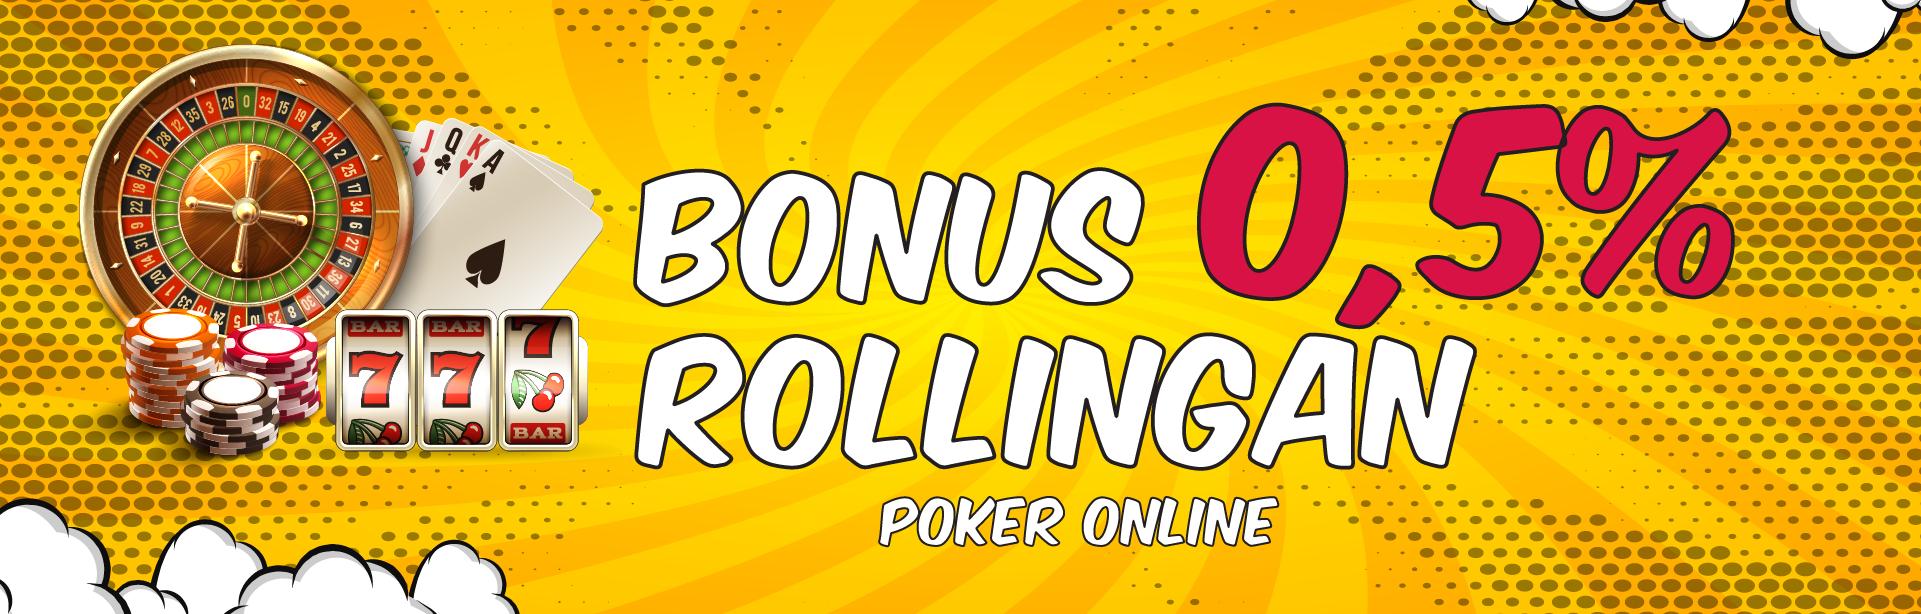 Bonus Rollingan Poker Online 0.5%